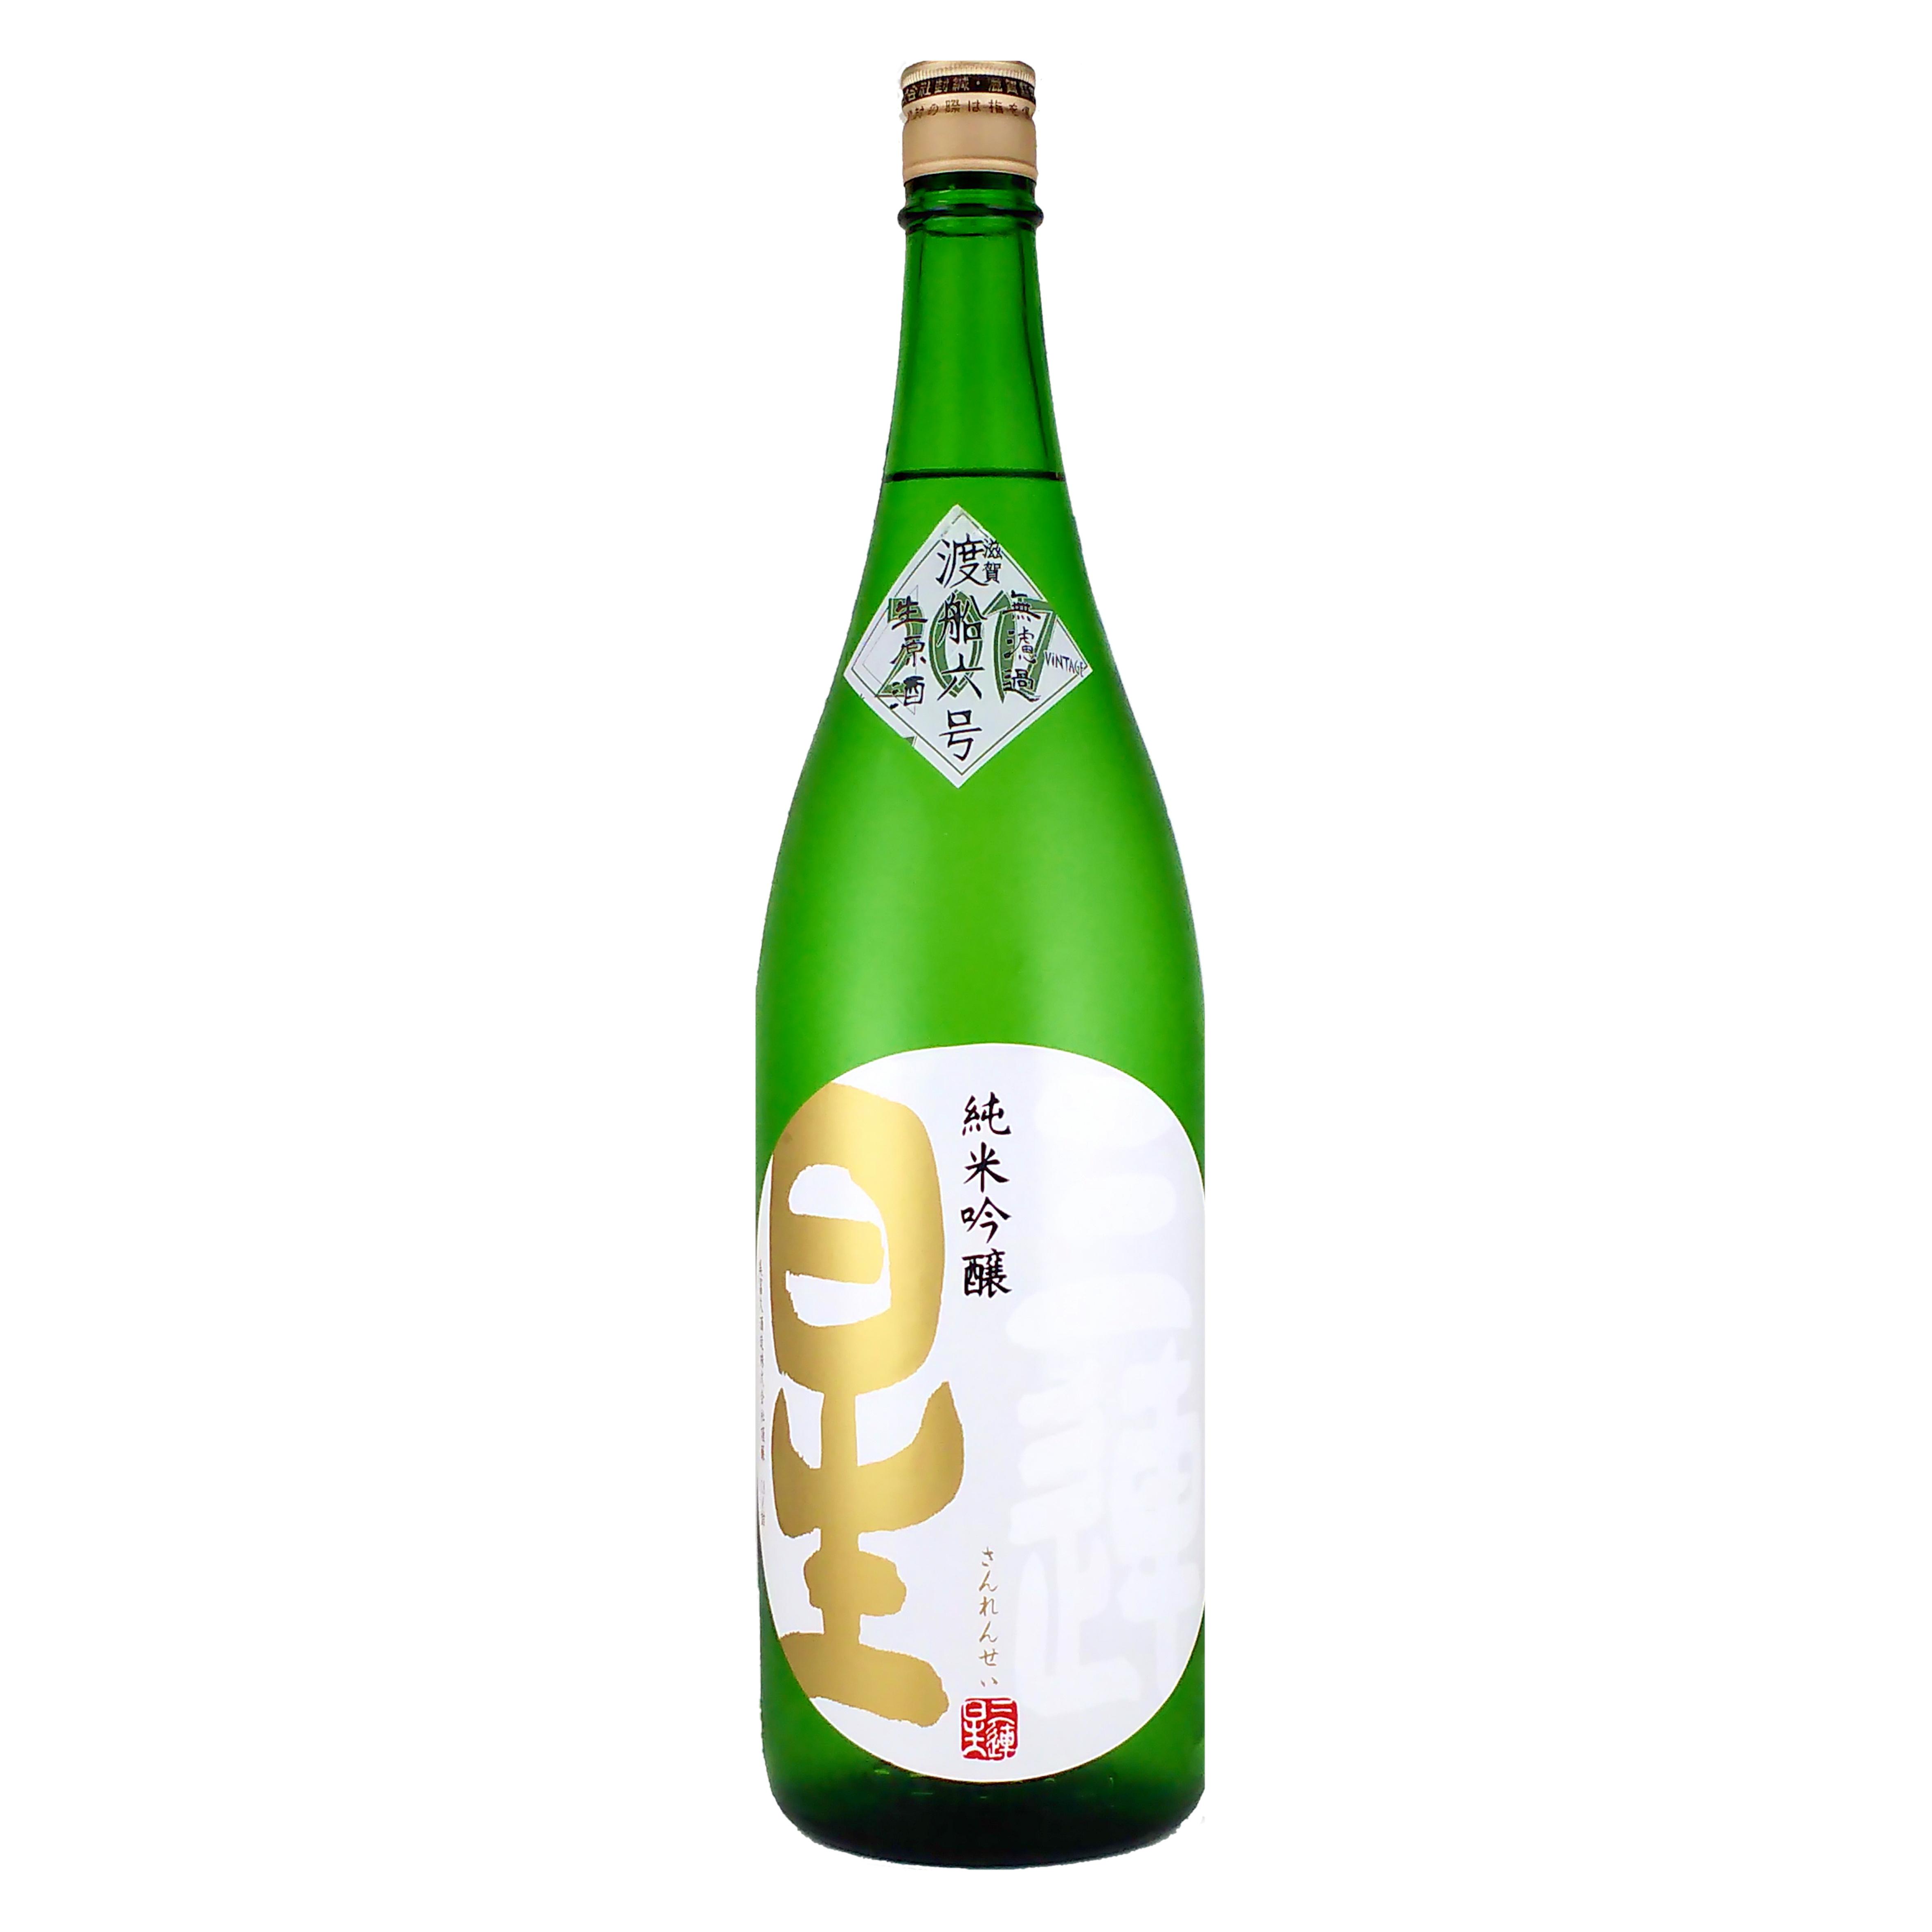 三連星 白ラベル 純米吟醸 無濾過生原酒